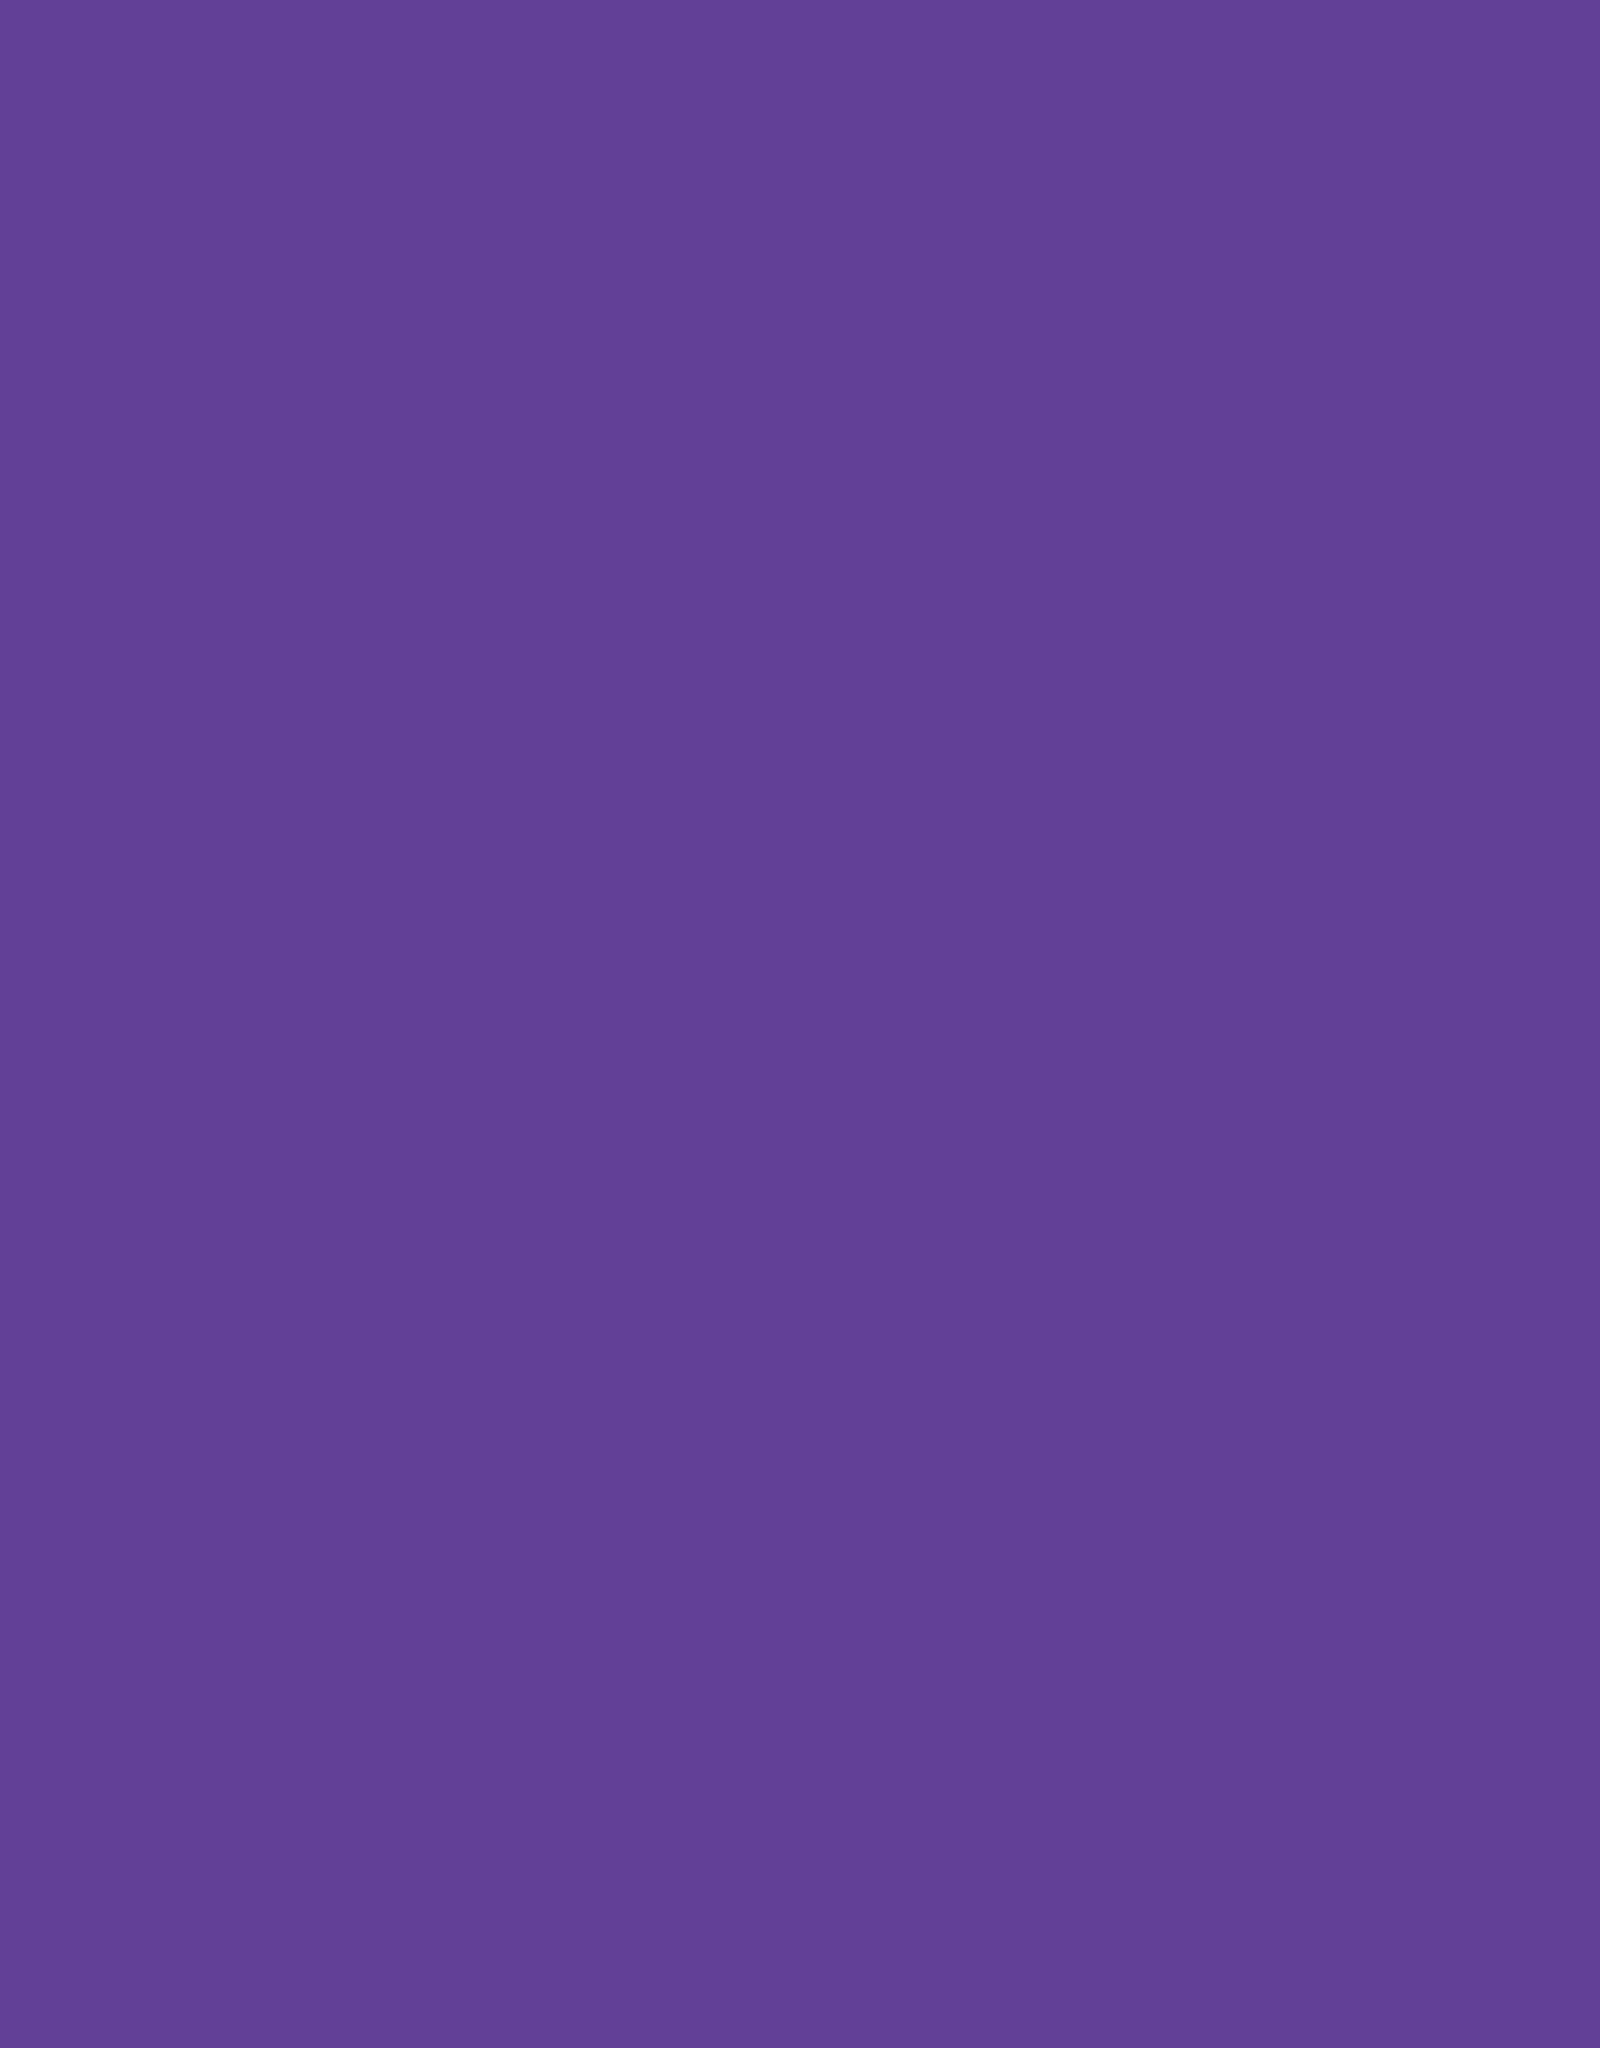 Jacquard Jacquard Screen Printing Ink #127 Opaque Violet 16oz